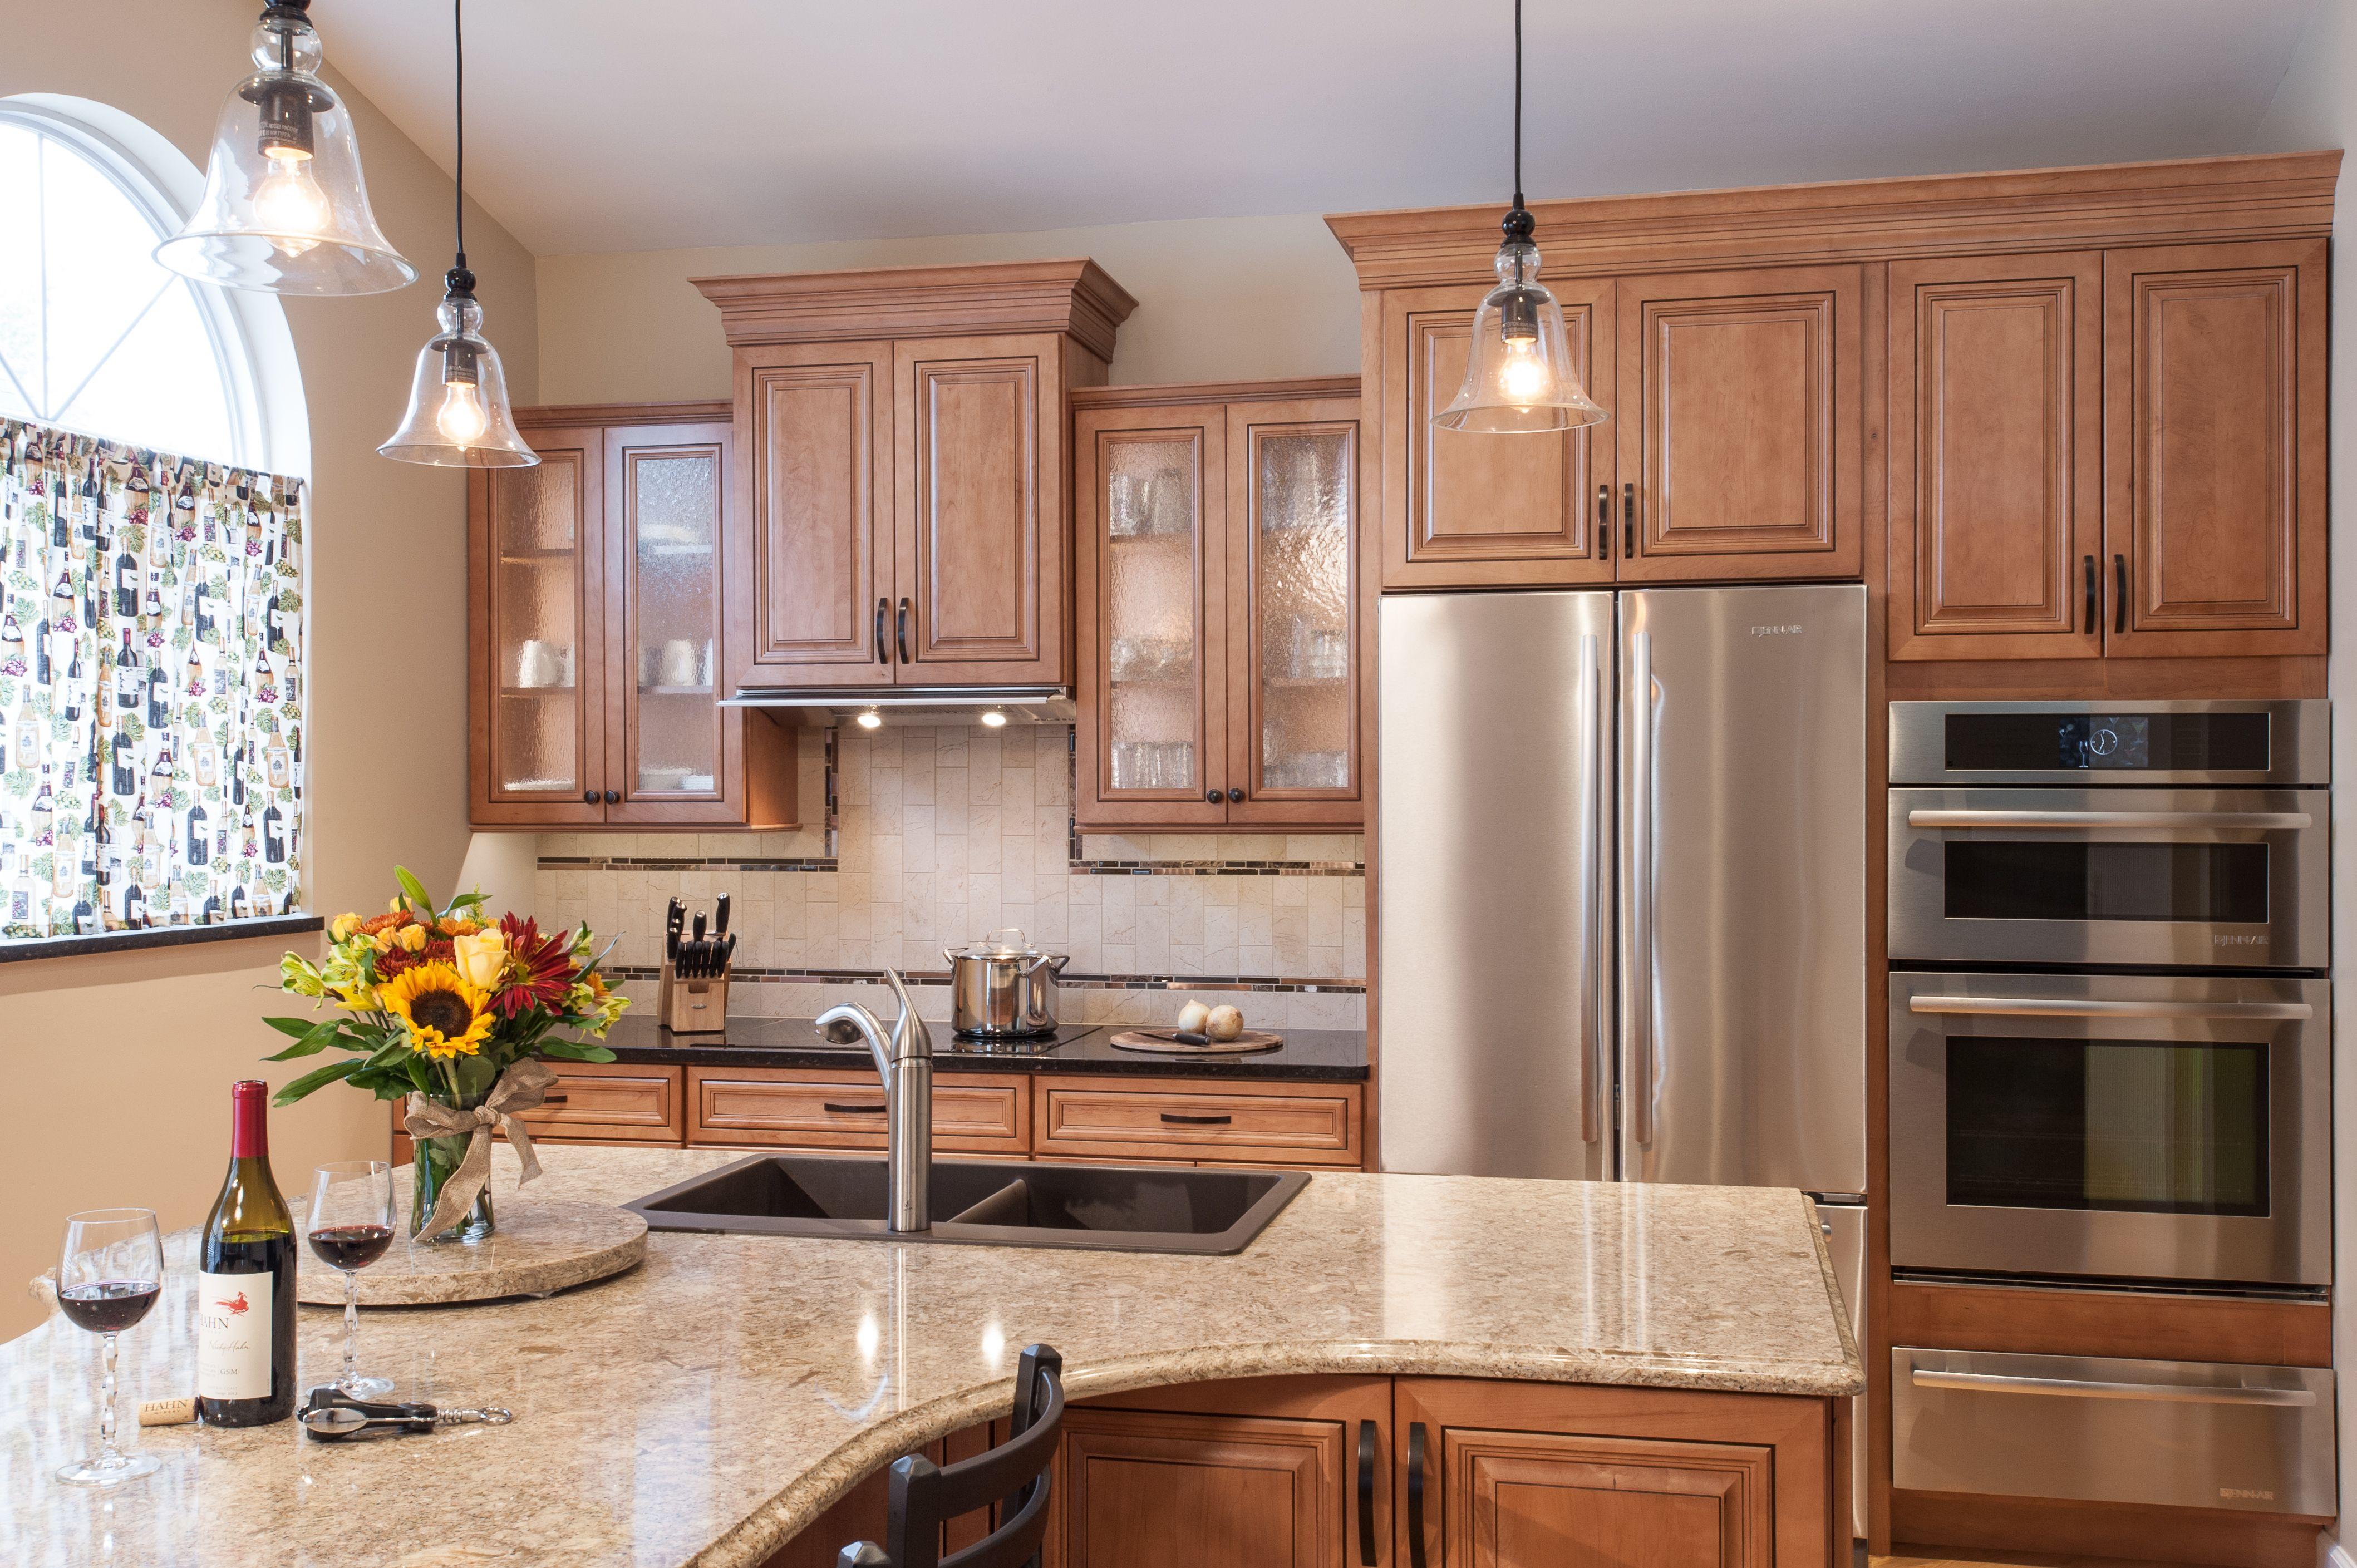 tiny talentneeds cabinets renovation custom design com small amazing kitchen ideas makeovers gallery